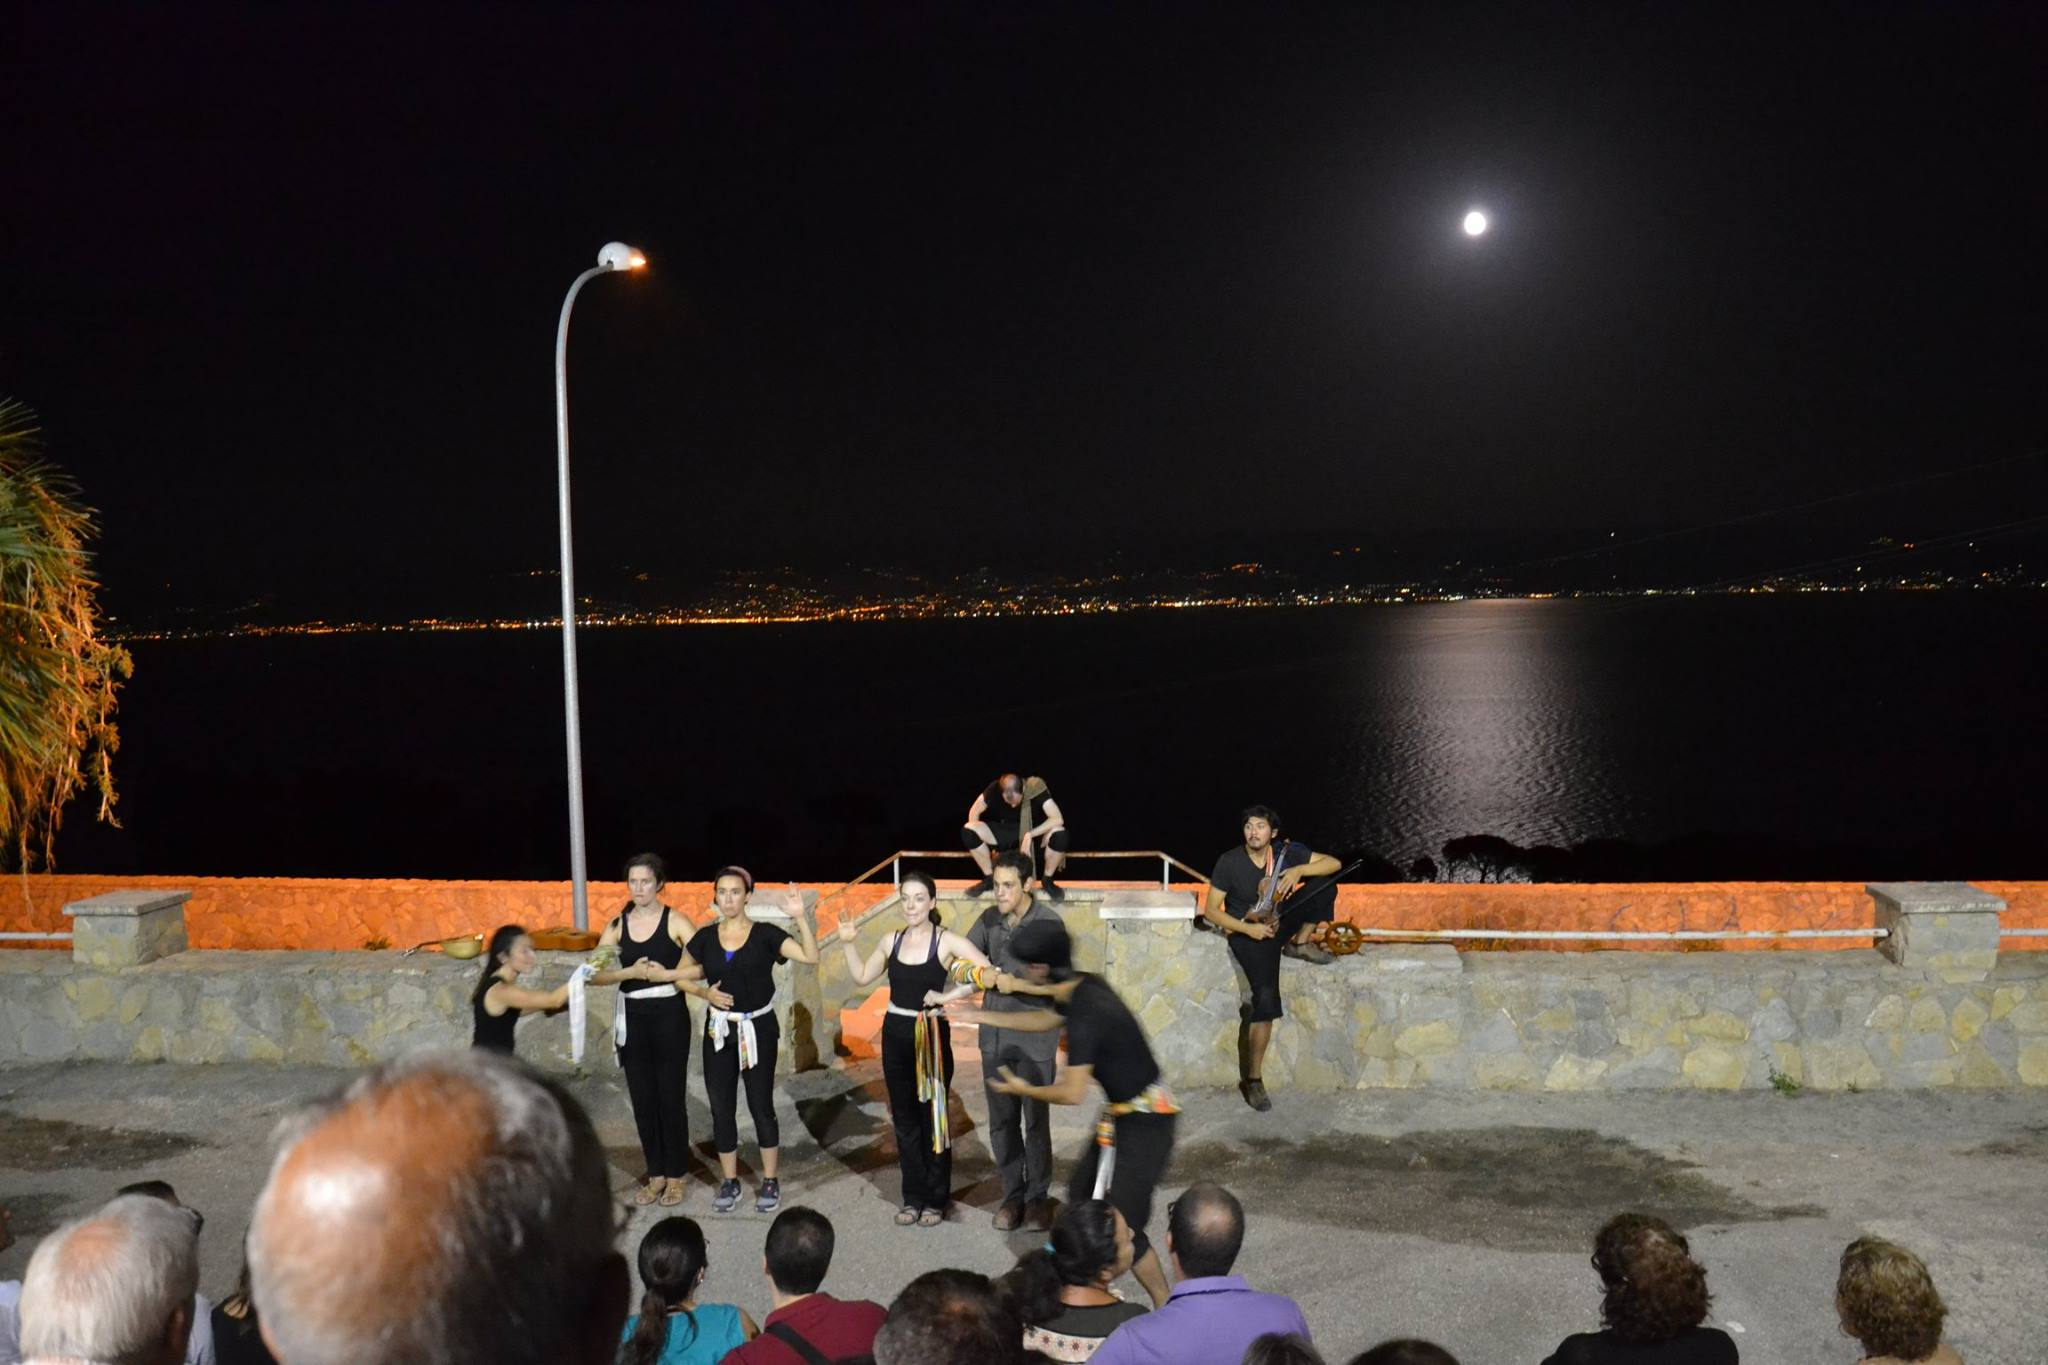 Photo courtesy of the Enoteca Provinciale Messina